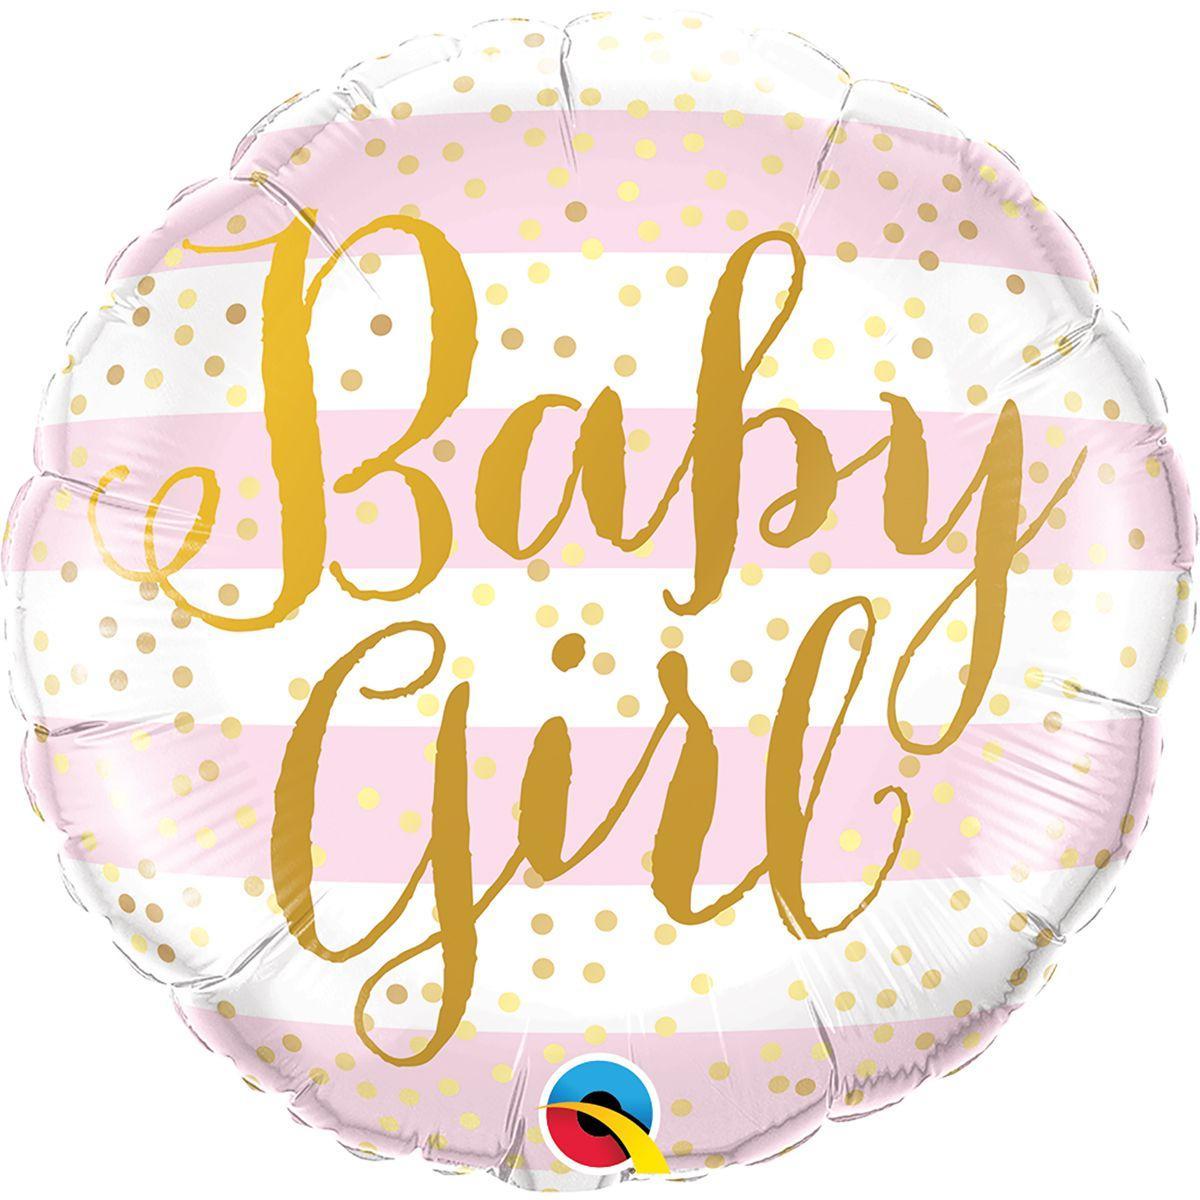 "Фол шар Qualatex 18"" Круг Baby Girl розовая и белая полоска (Квалатекс)"